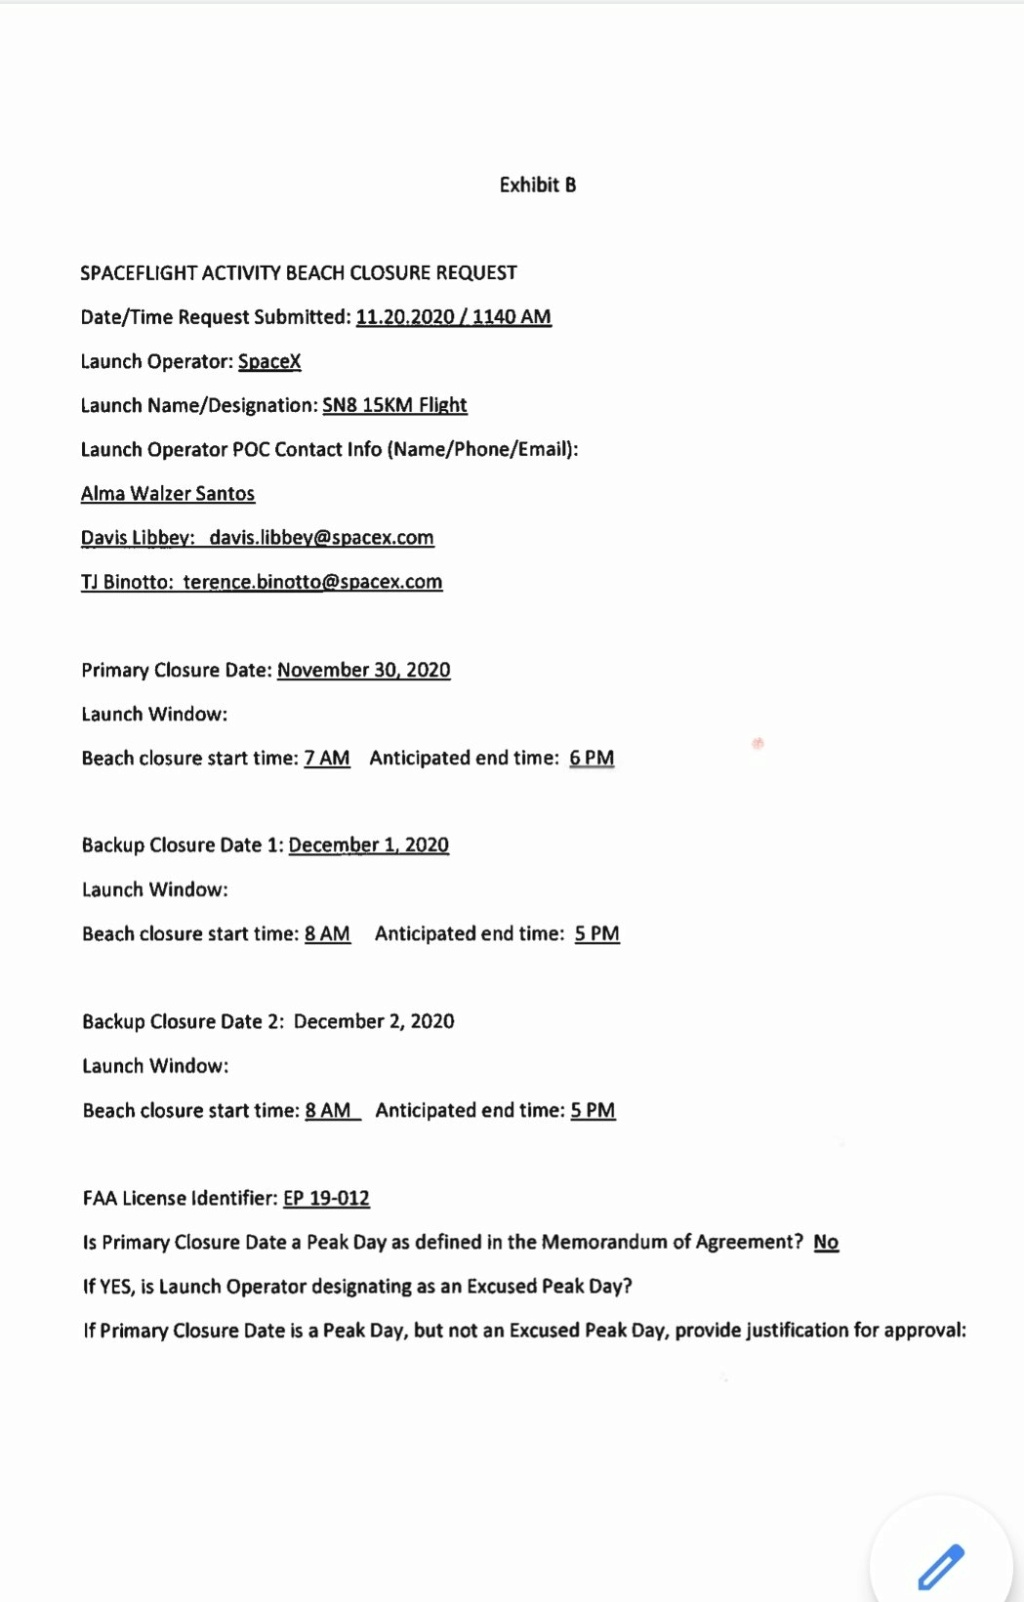 Starship SN8 (Boca Chica) (1/2) - Page 23 20201110